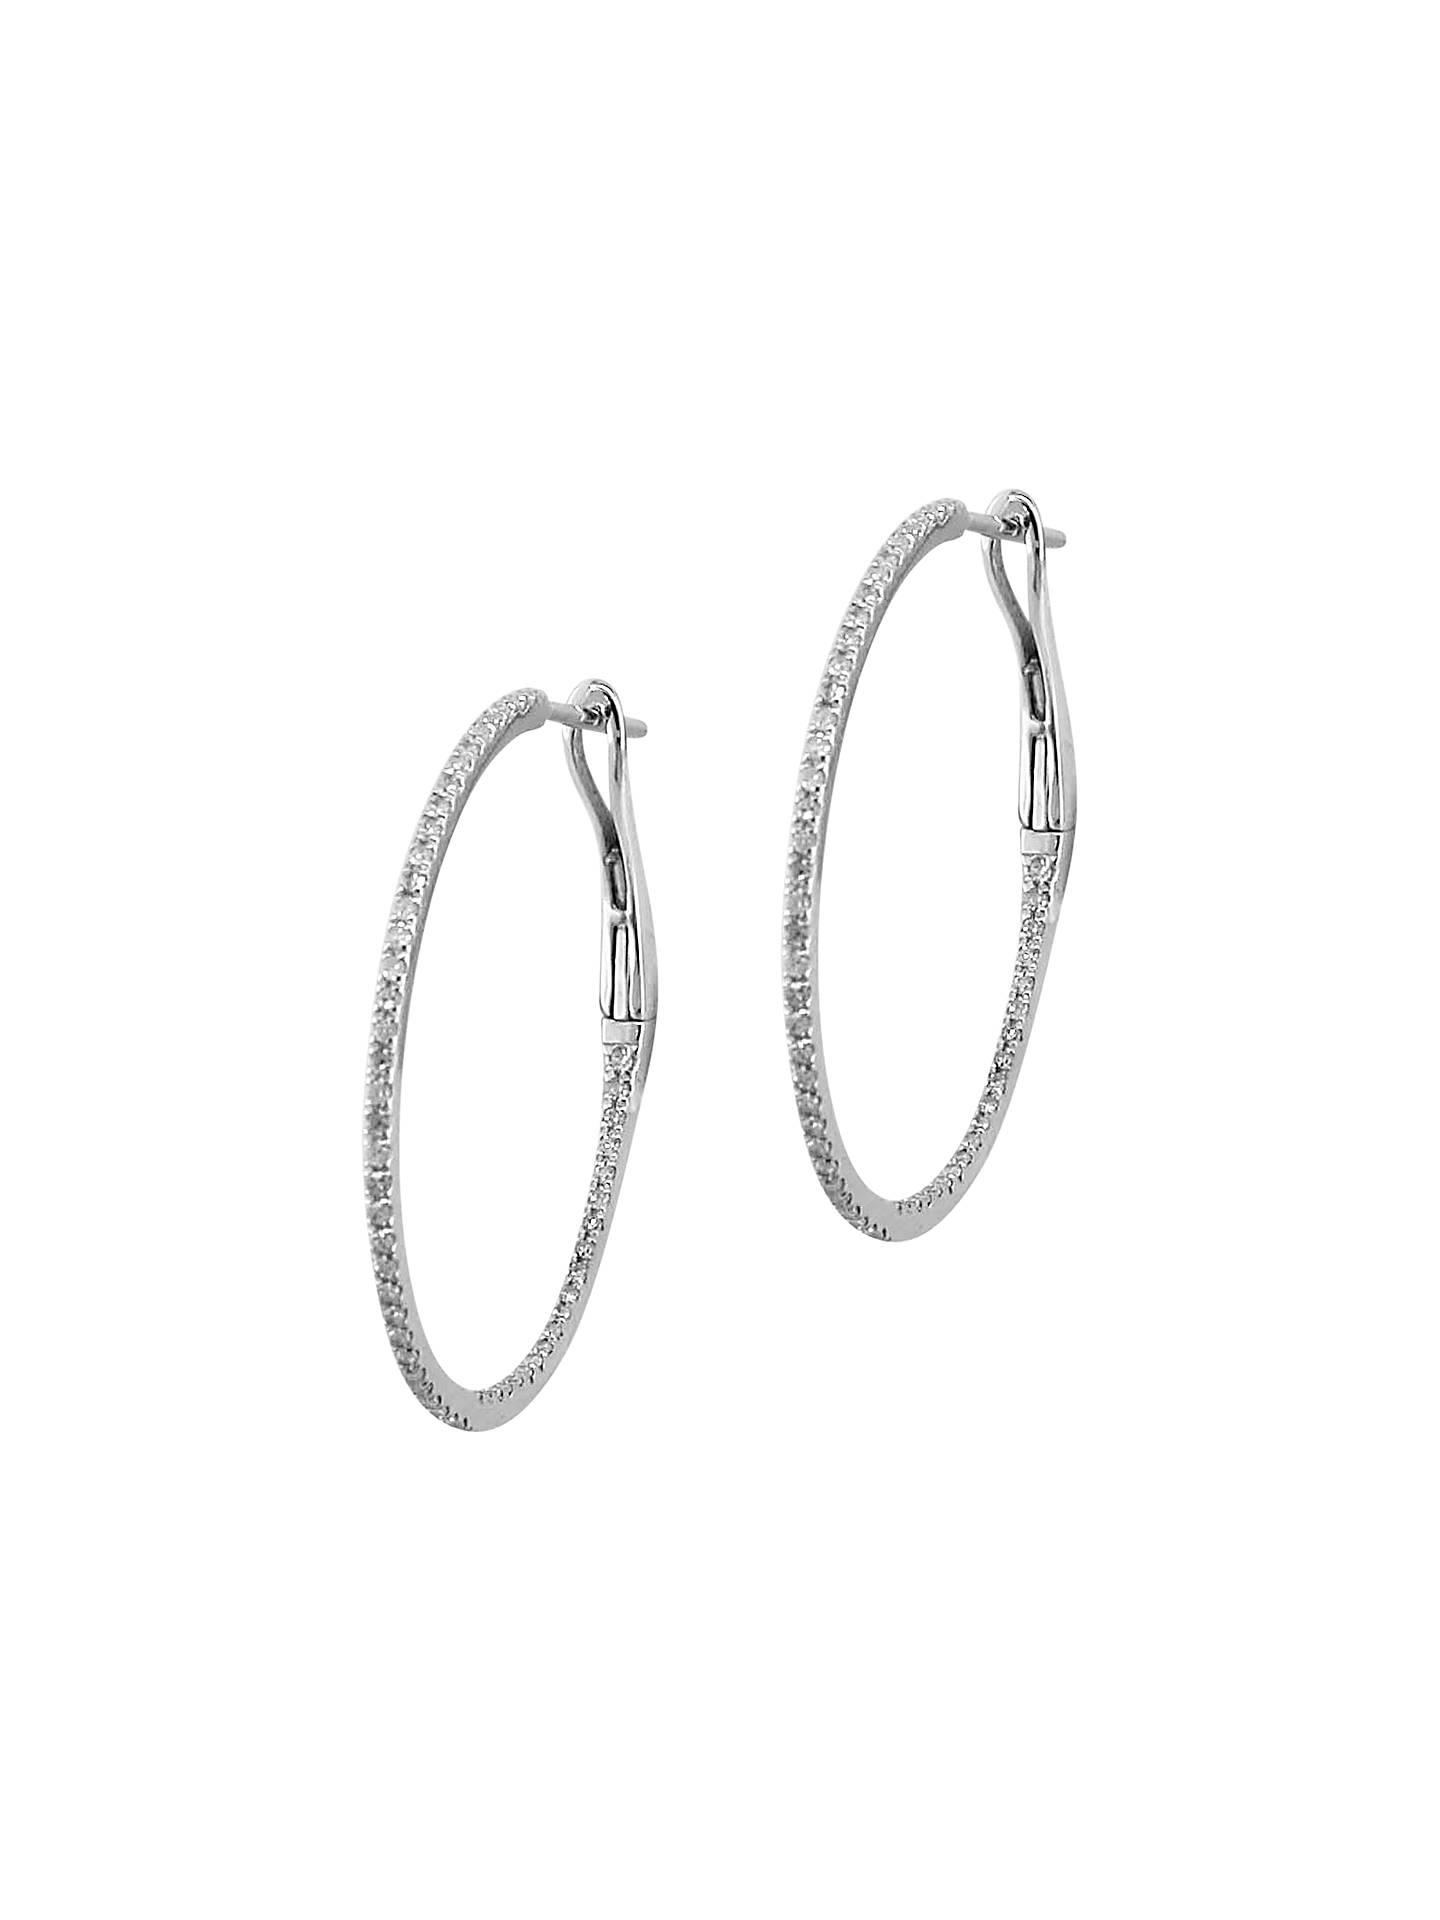 E W Adams 18ct White Gold Diamond Row Hoop Earrings 0 29ct